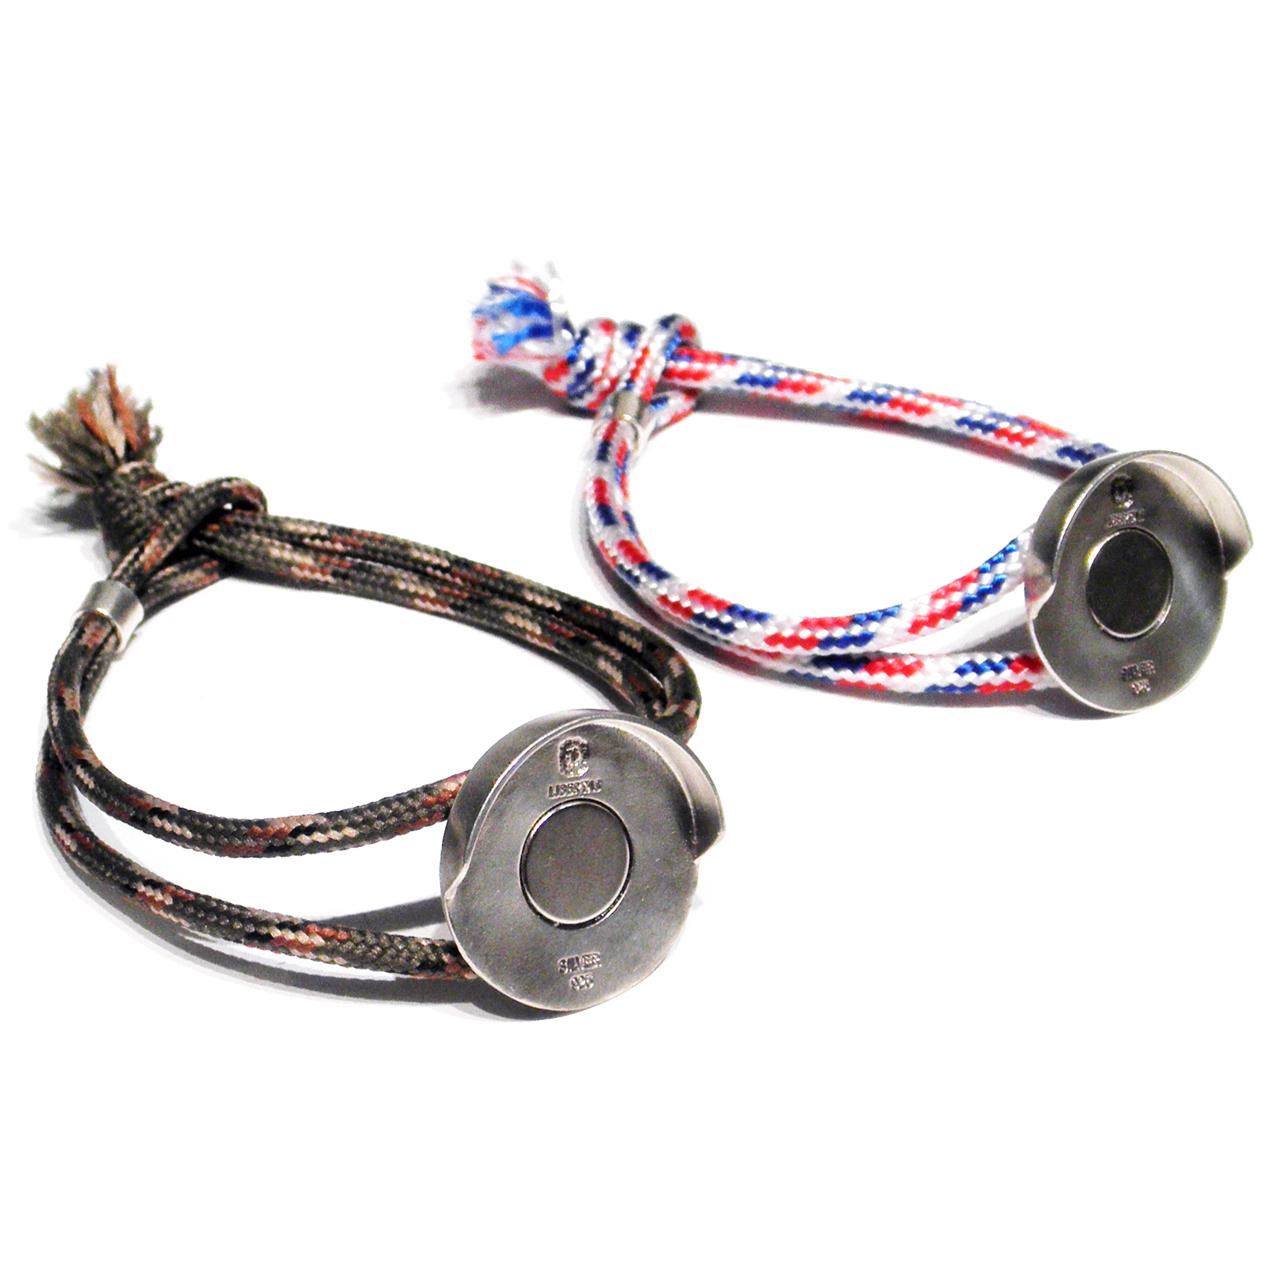 Bracelet Marker Holder LC (ゴルフボールマーカーアタッチメント)